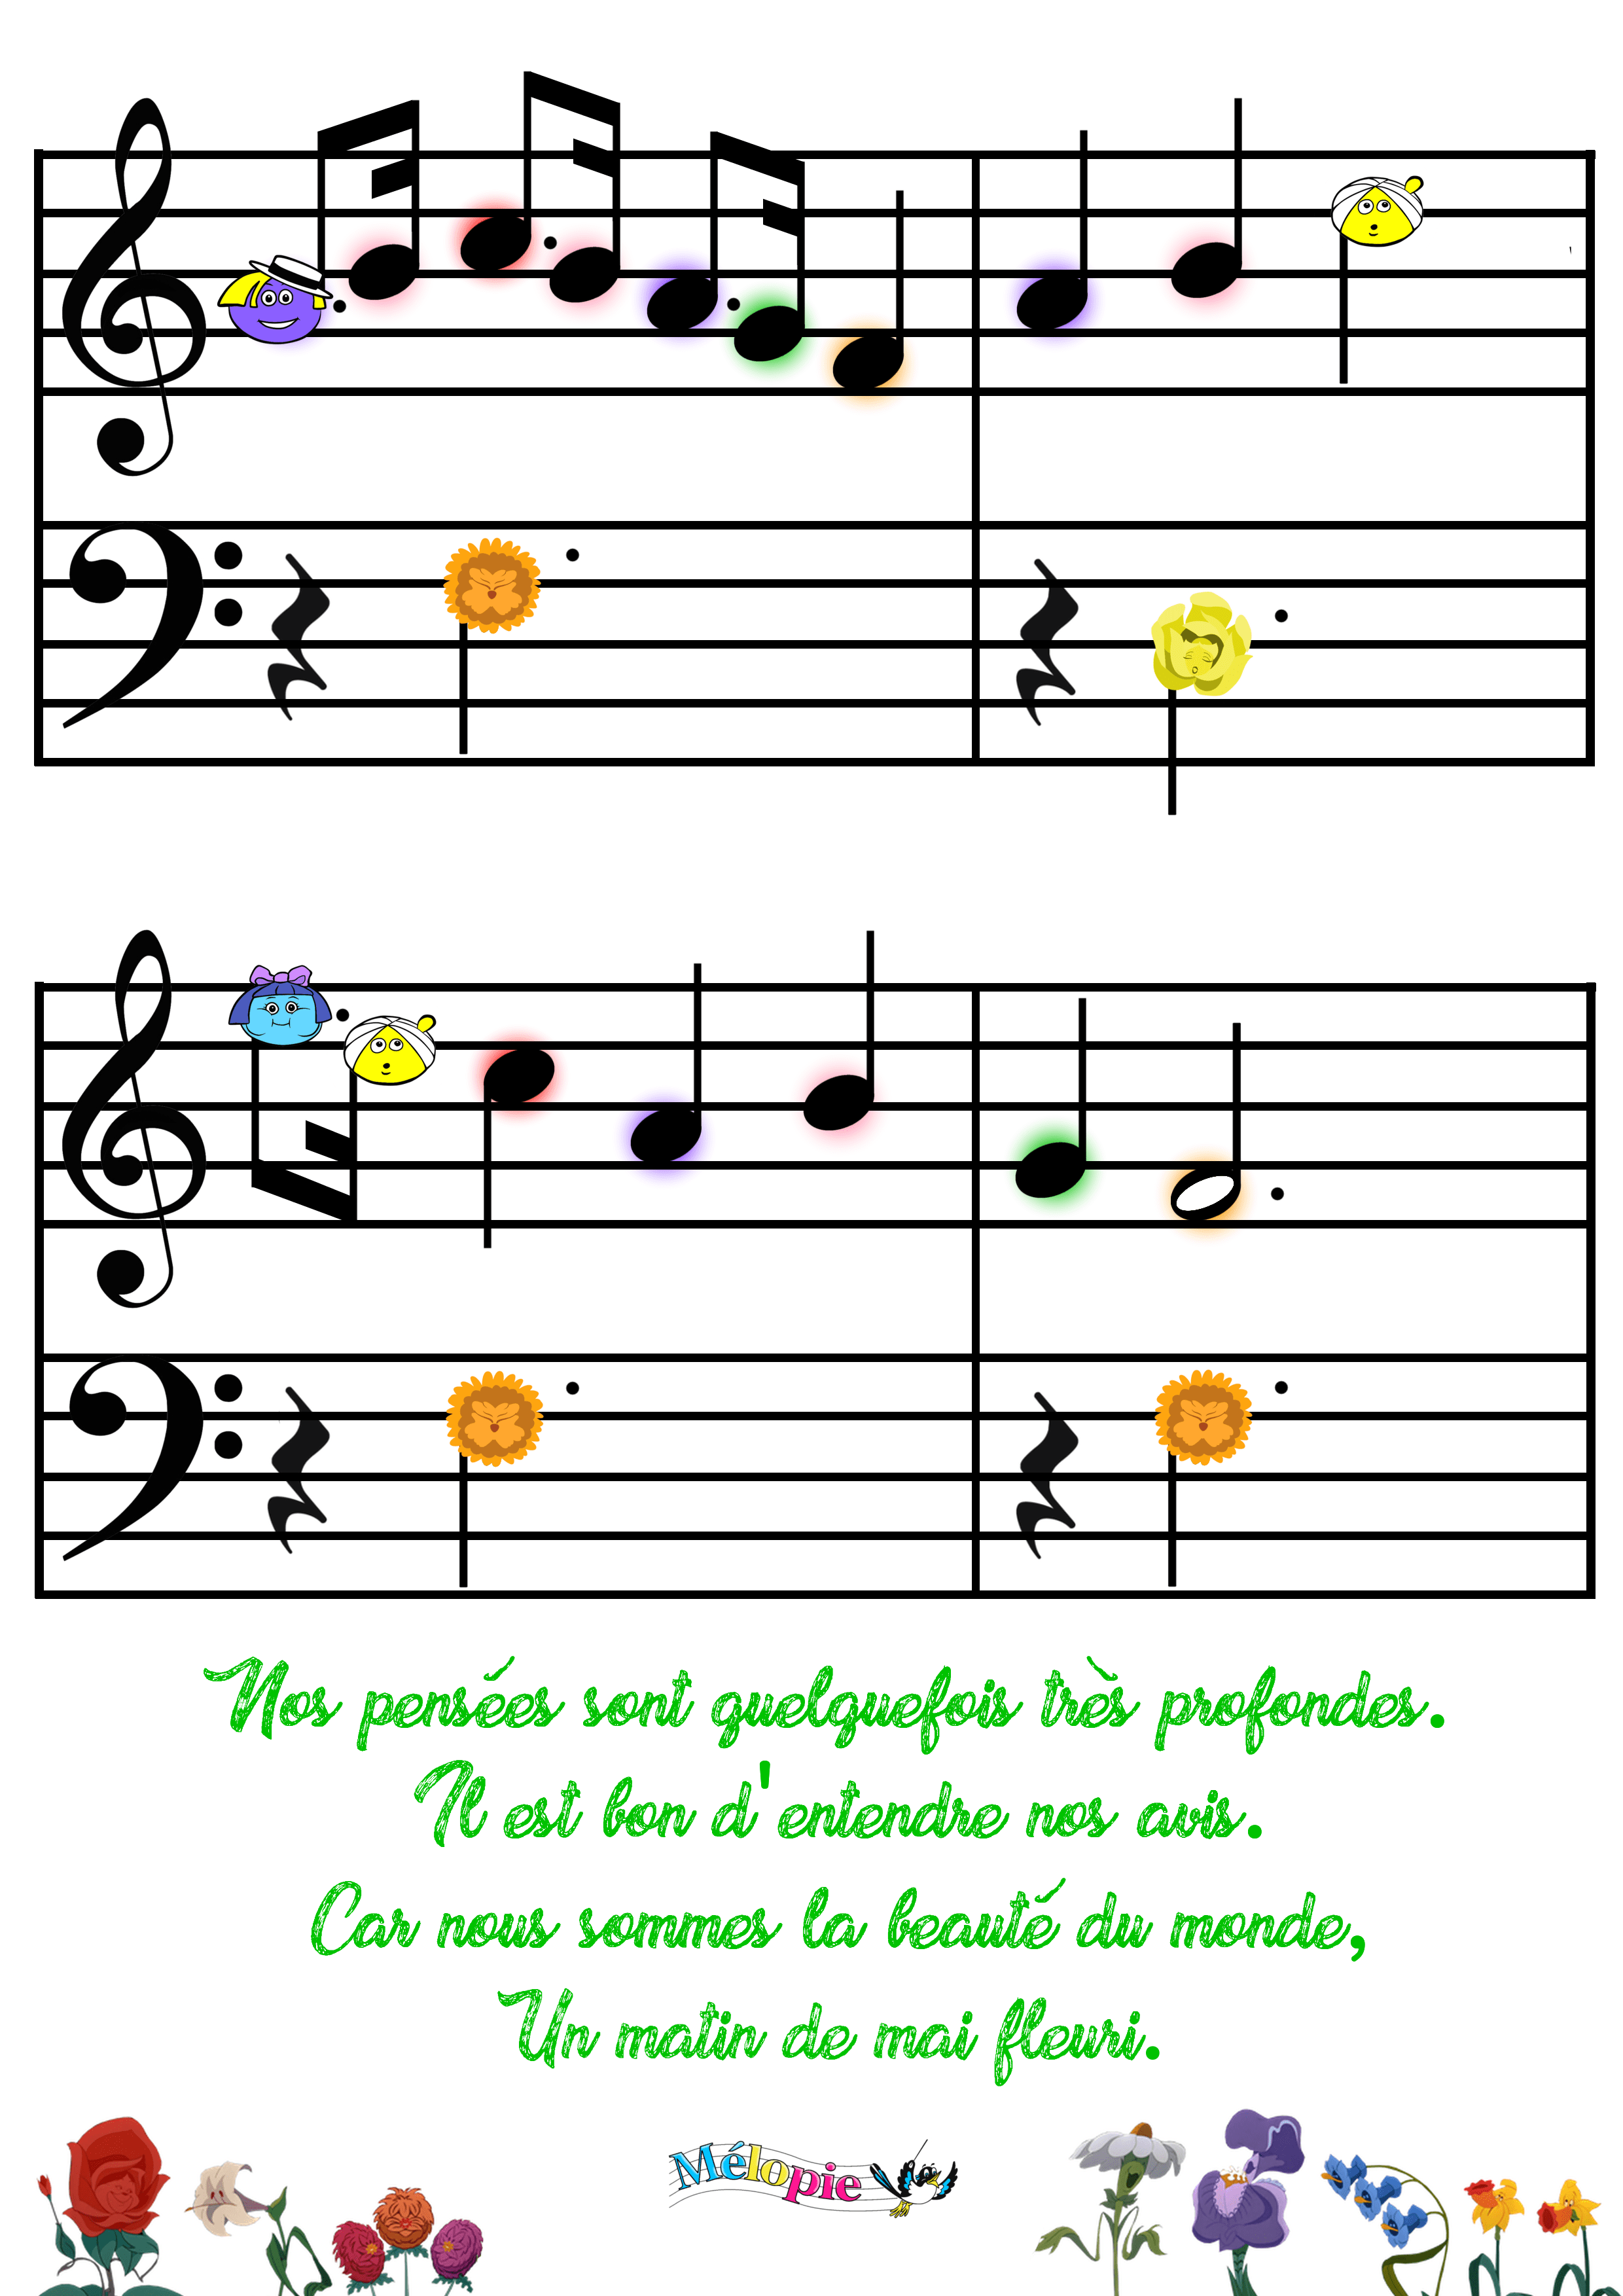 Partition Piano Disney Gratuite Imprimer Partition Piano Partition Piano